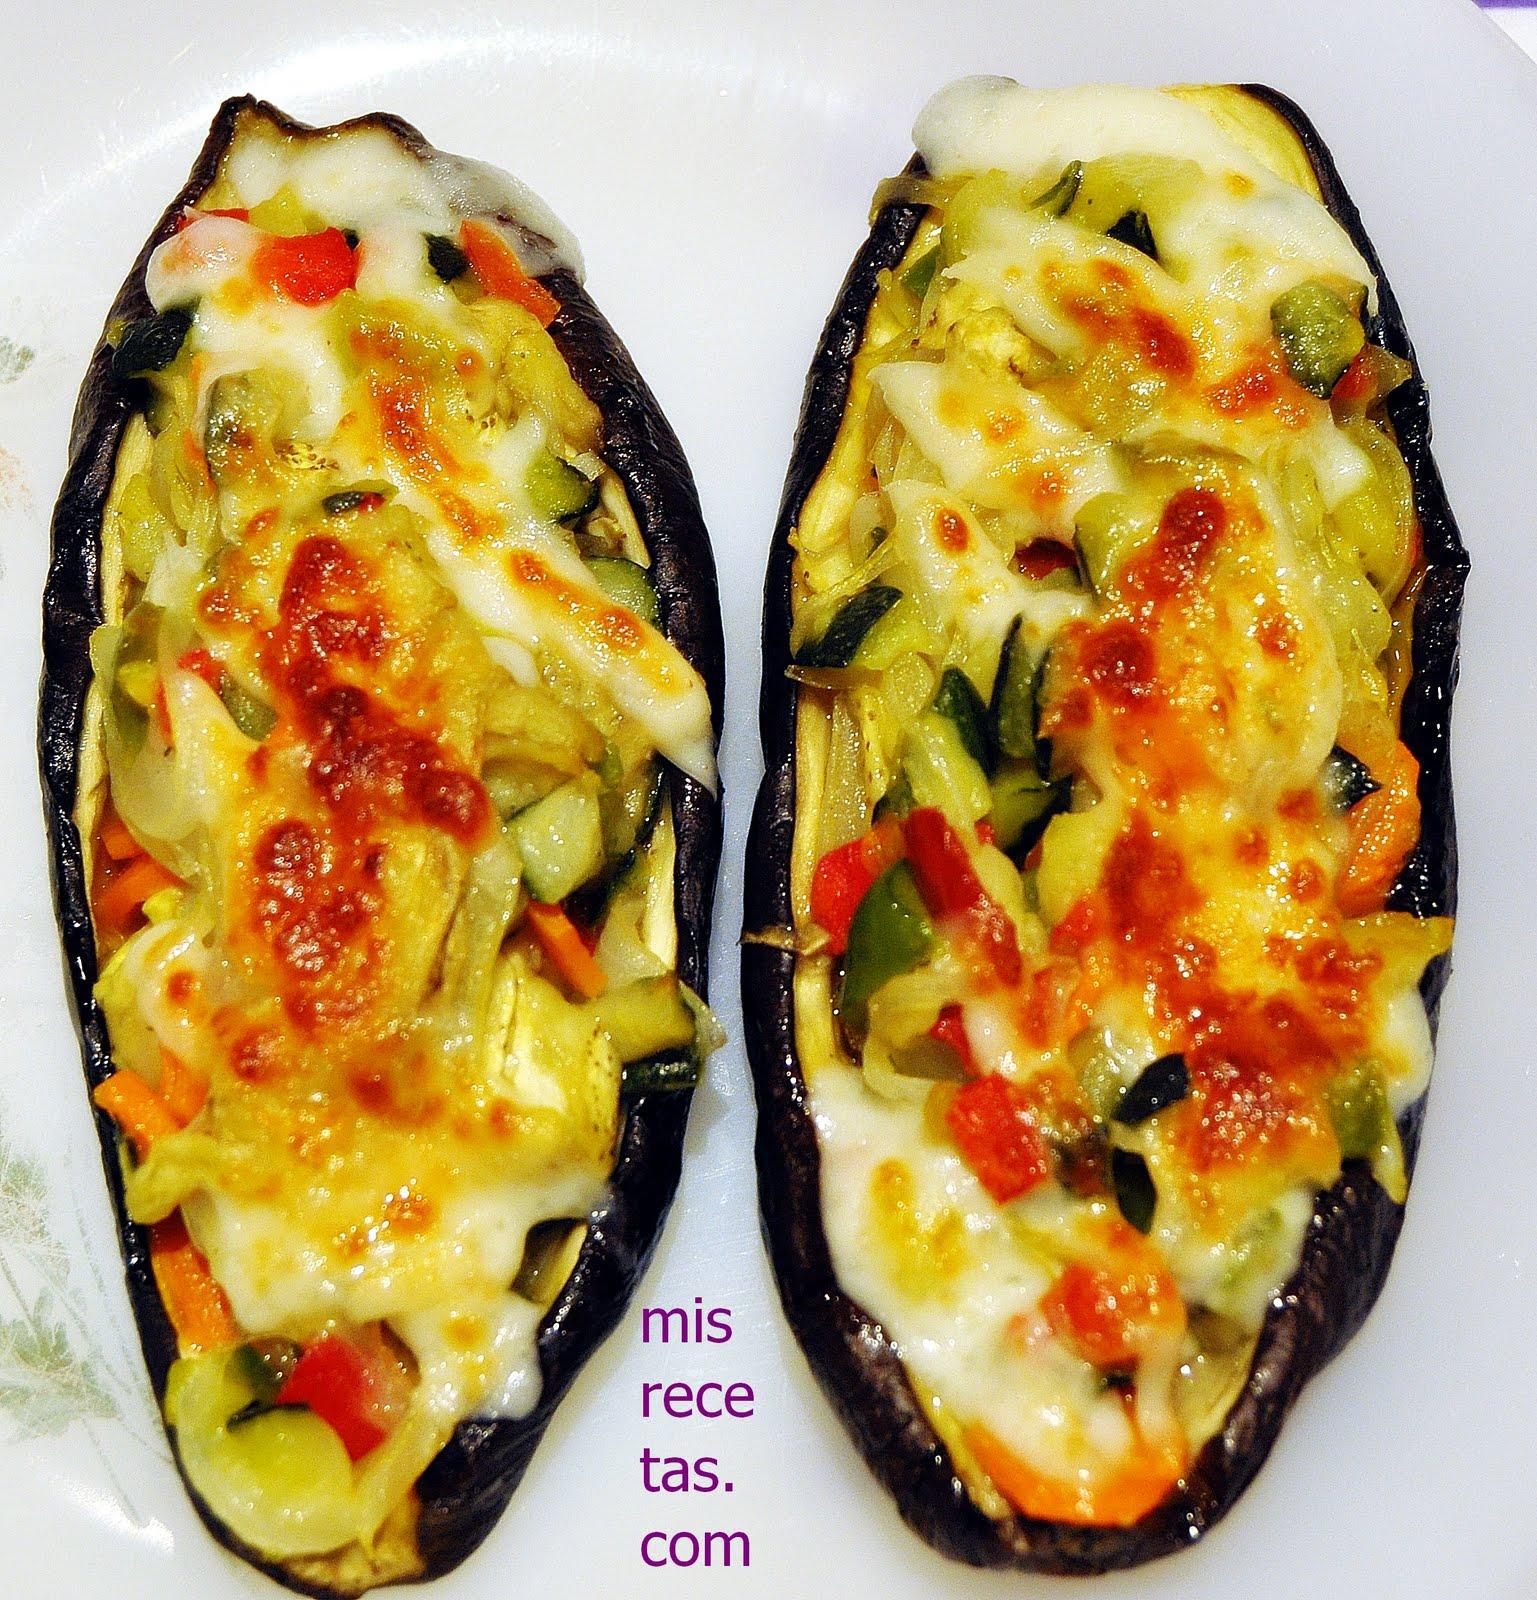 Mis recetas com berenjenas rellenas de verduras - Berenjenas rellenas al horno ...